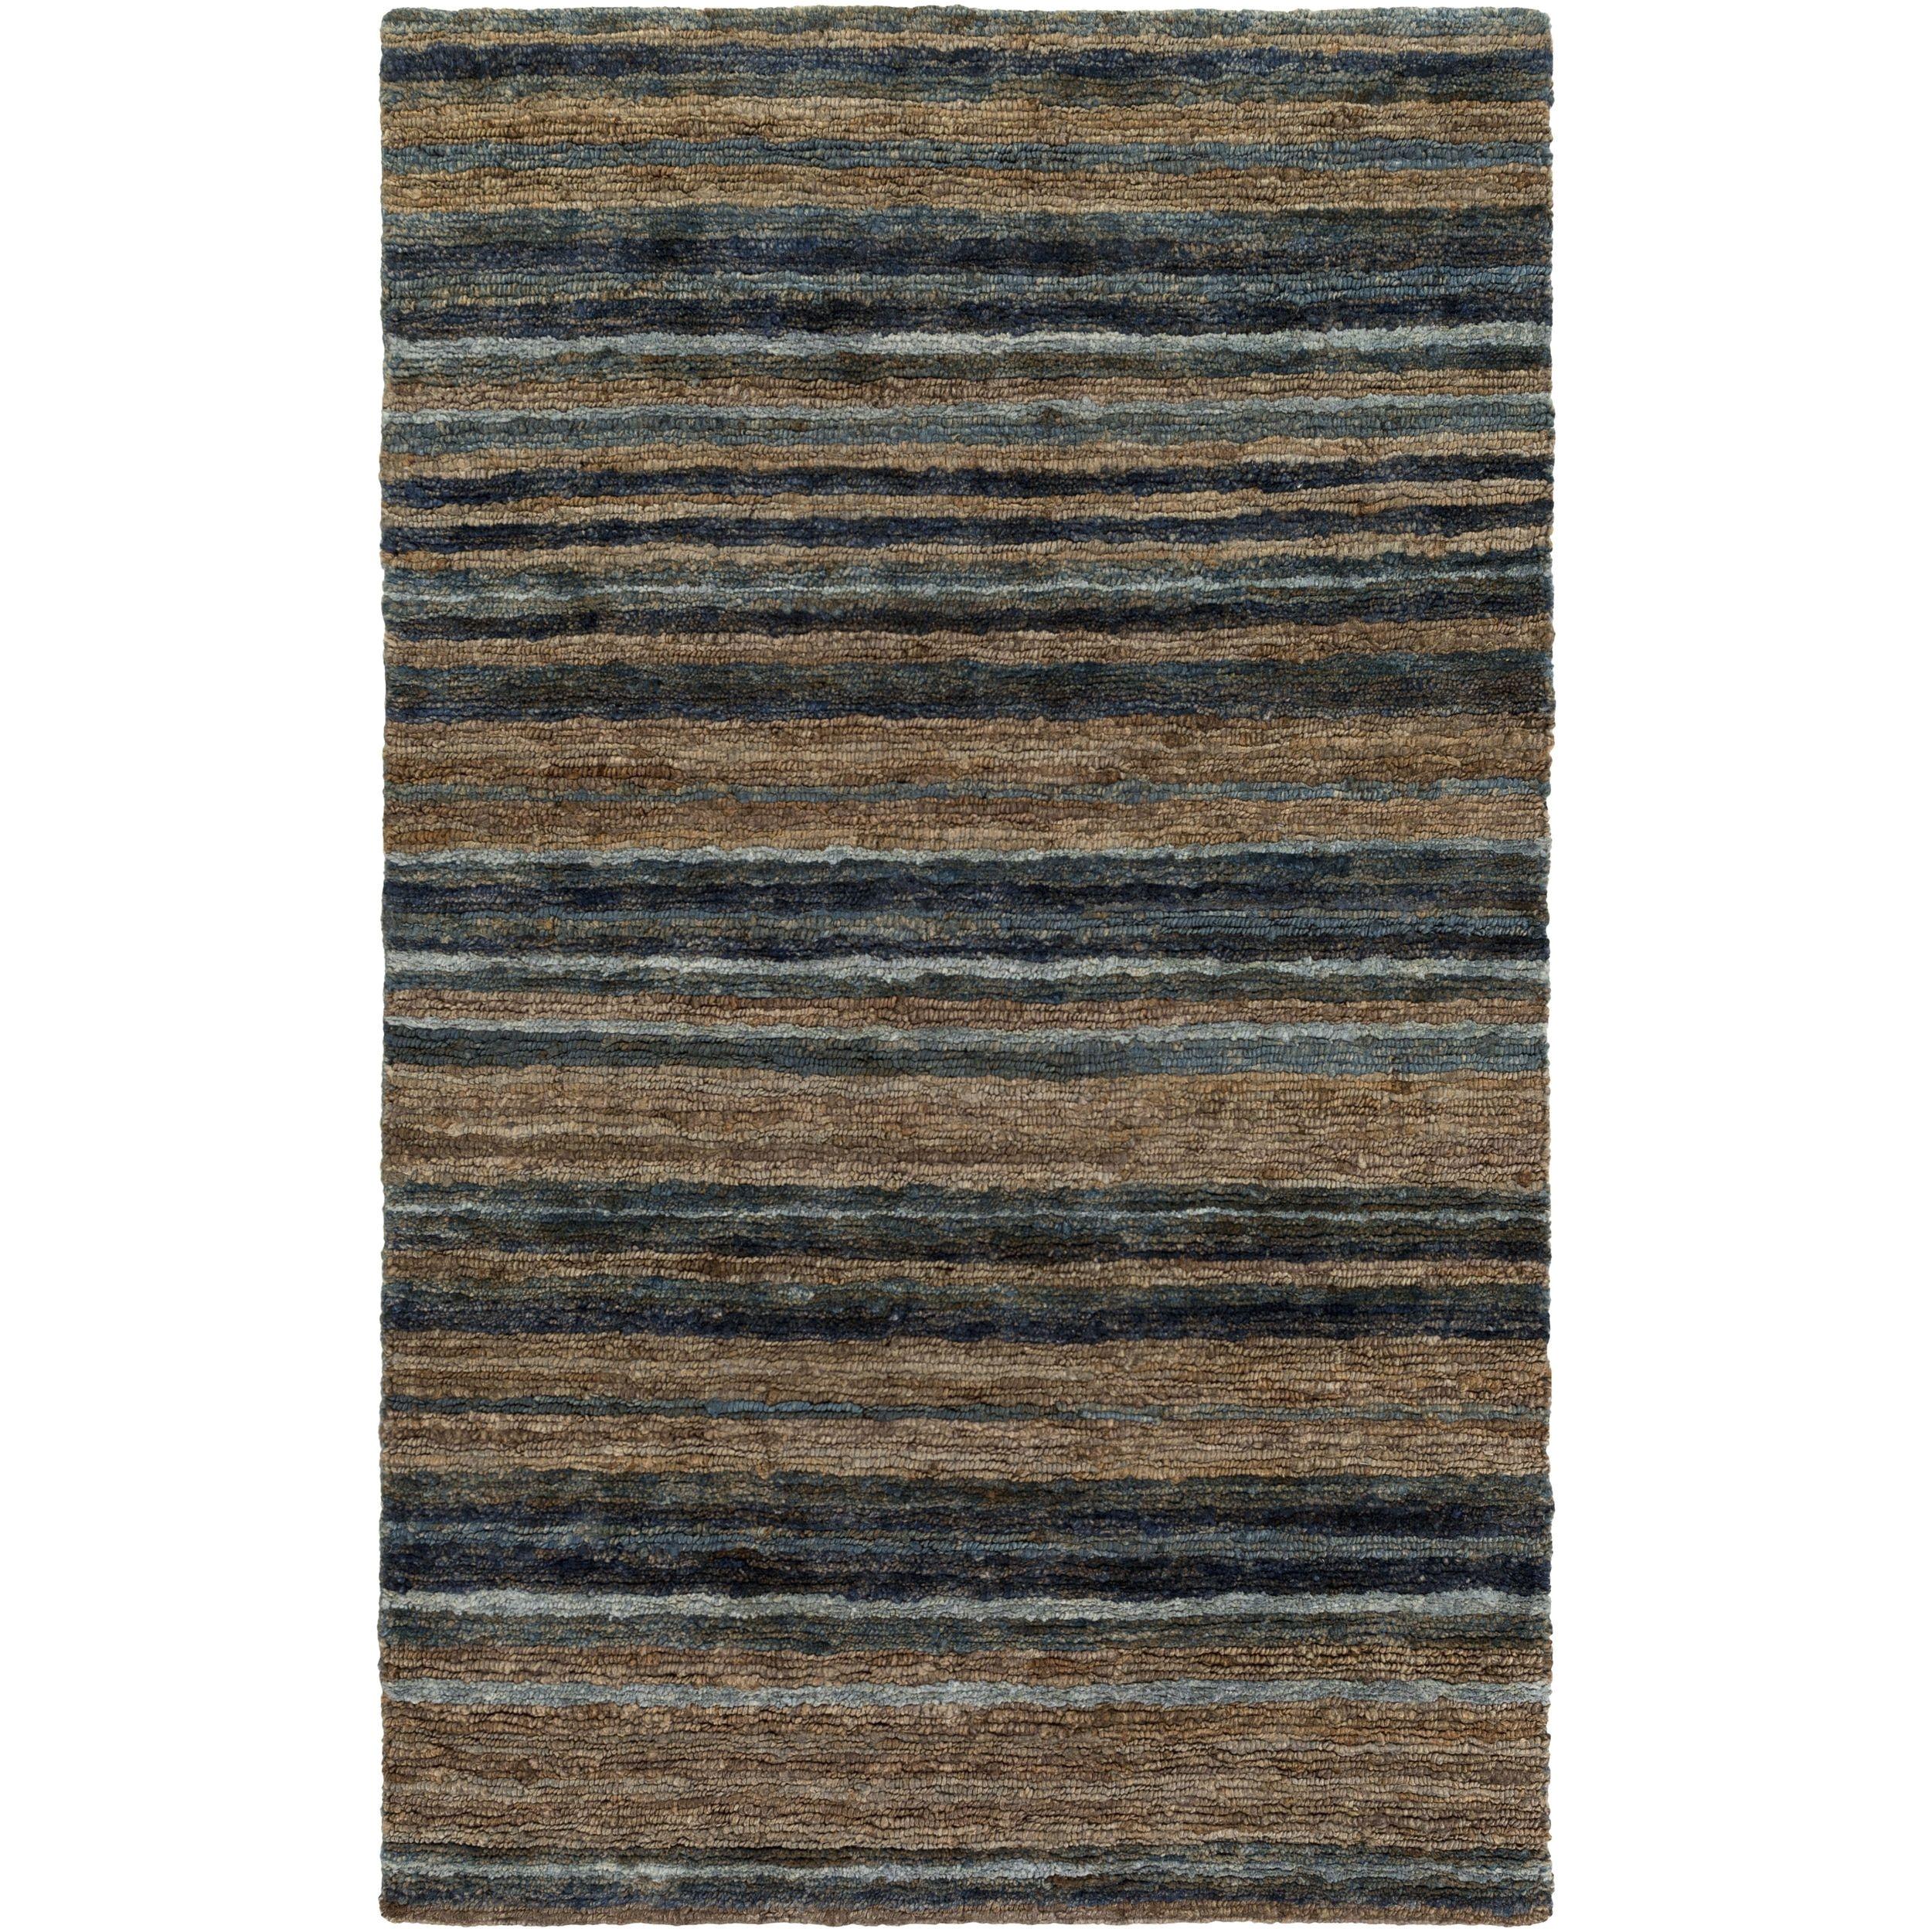 hand woven jeff stripe hemp textured rug 3 3 x 5 3 olive 3 3 x 5 3 green